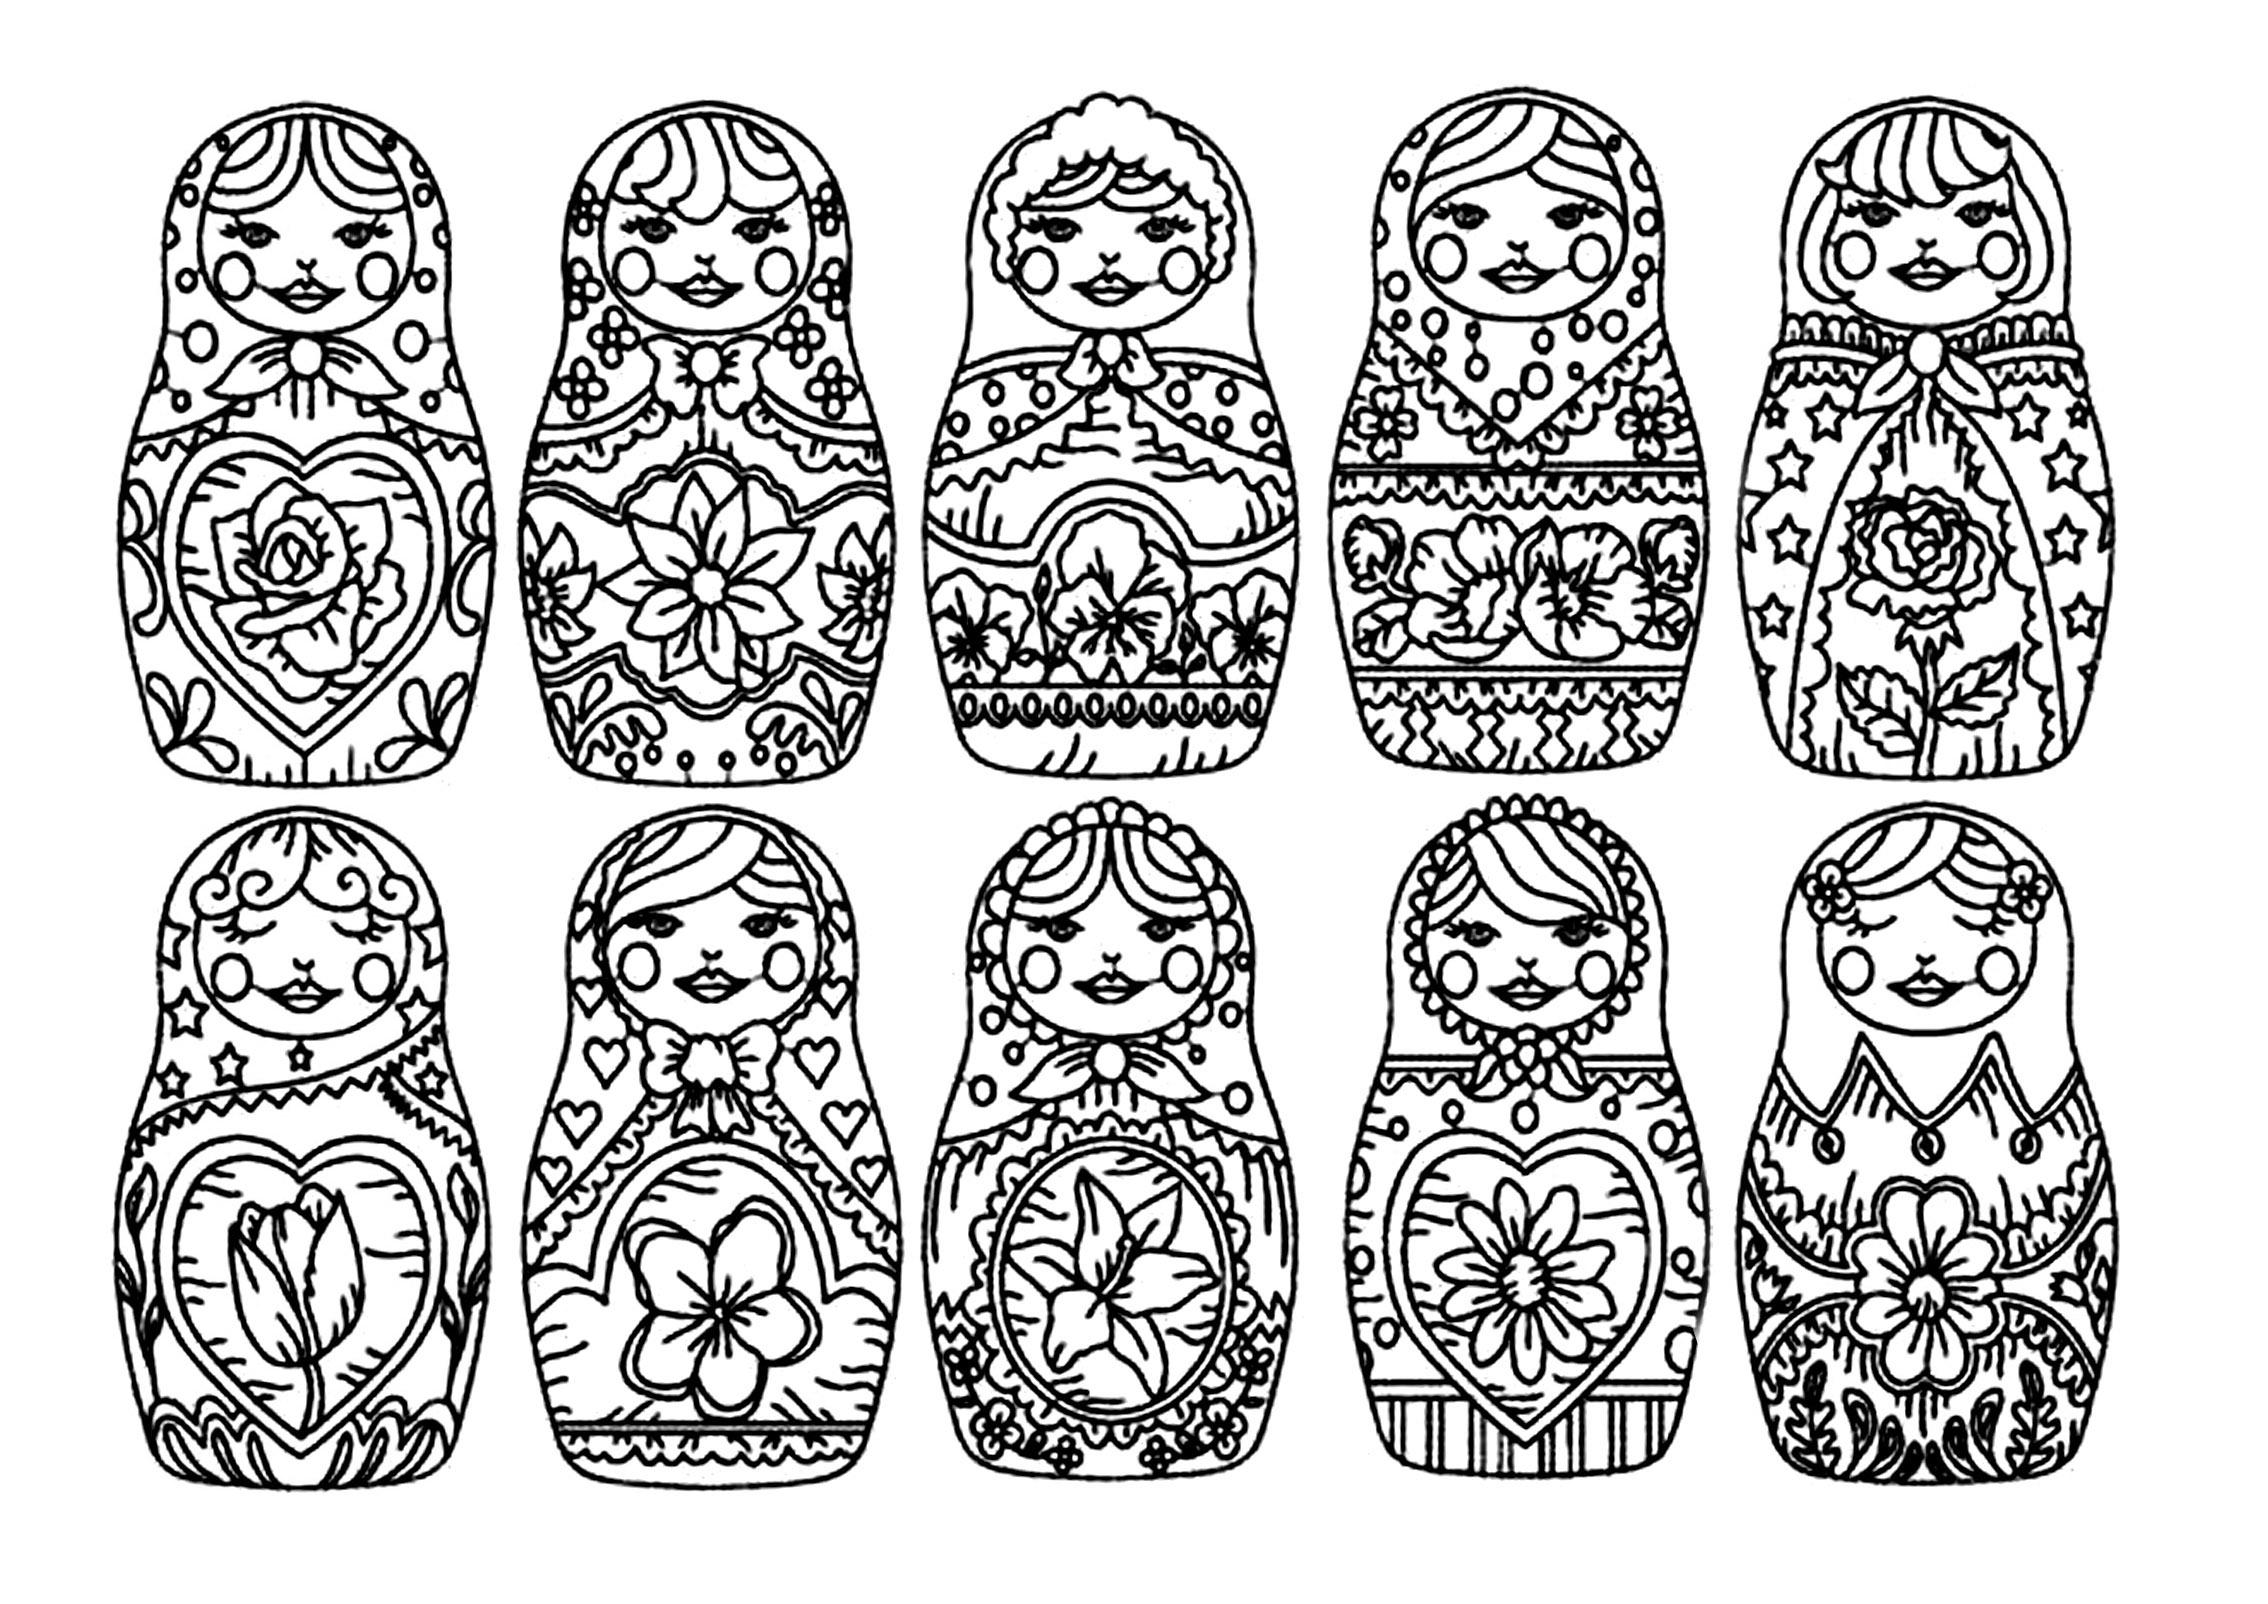 Colorear para adultos : Muñecas Rusas - 10